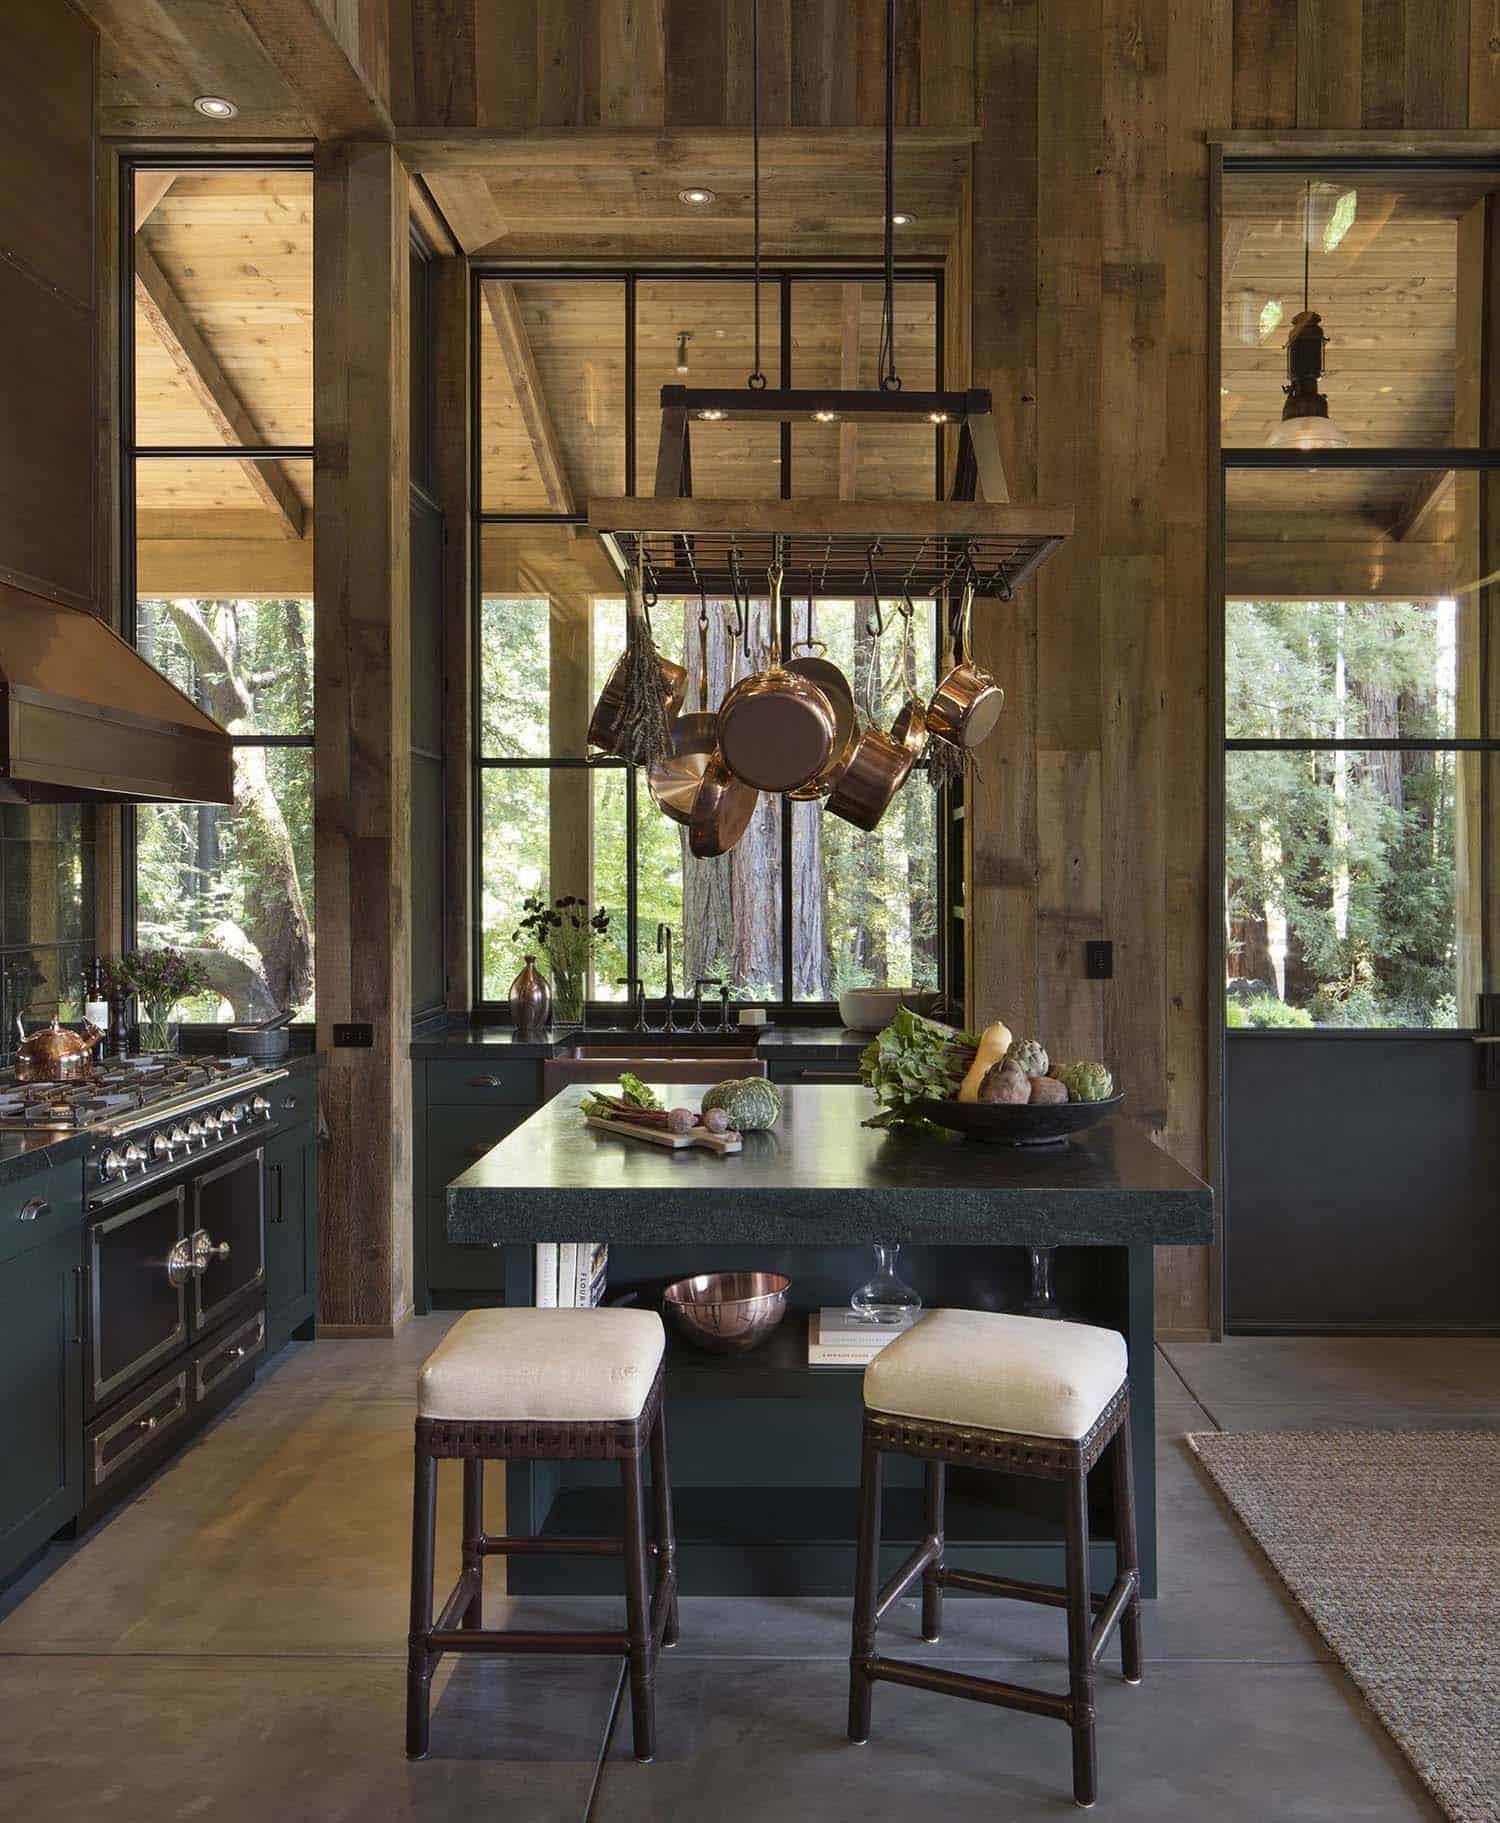 Maison de style ferme-Jennifer Robin Interiors-006-1 Kindesign